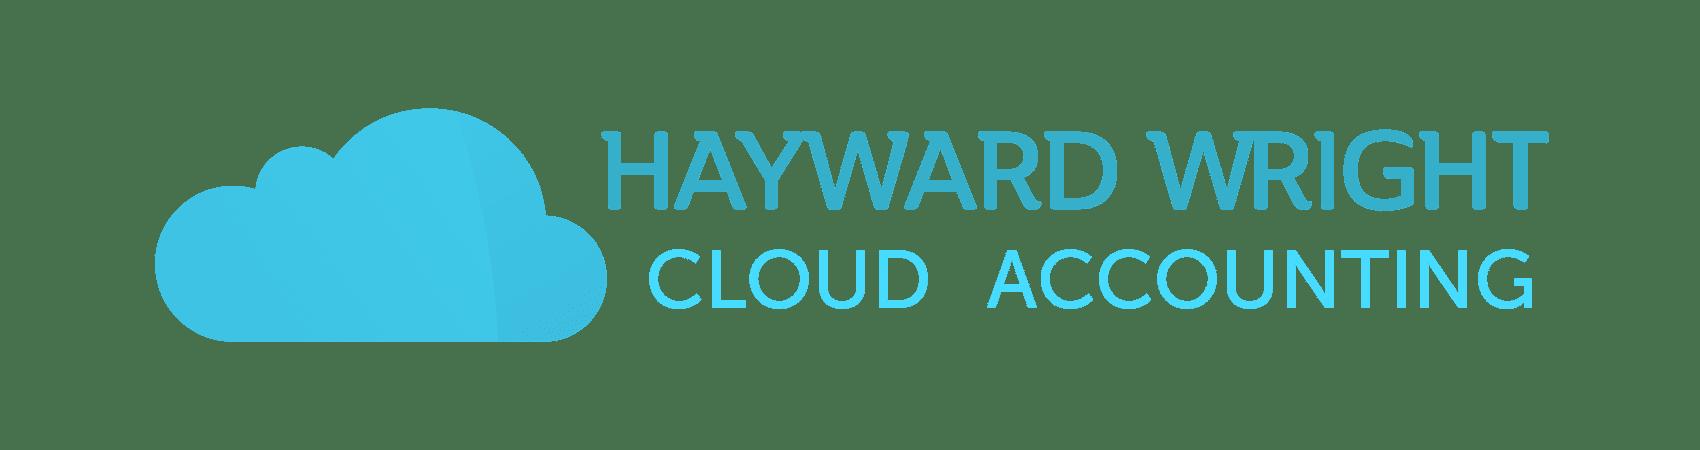 hayward wright cloud accounting blue logo